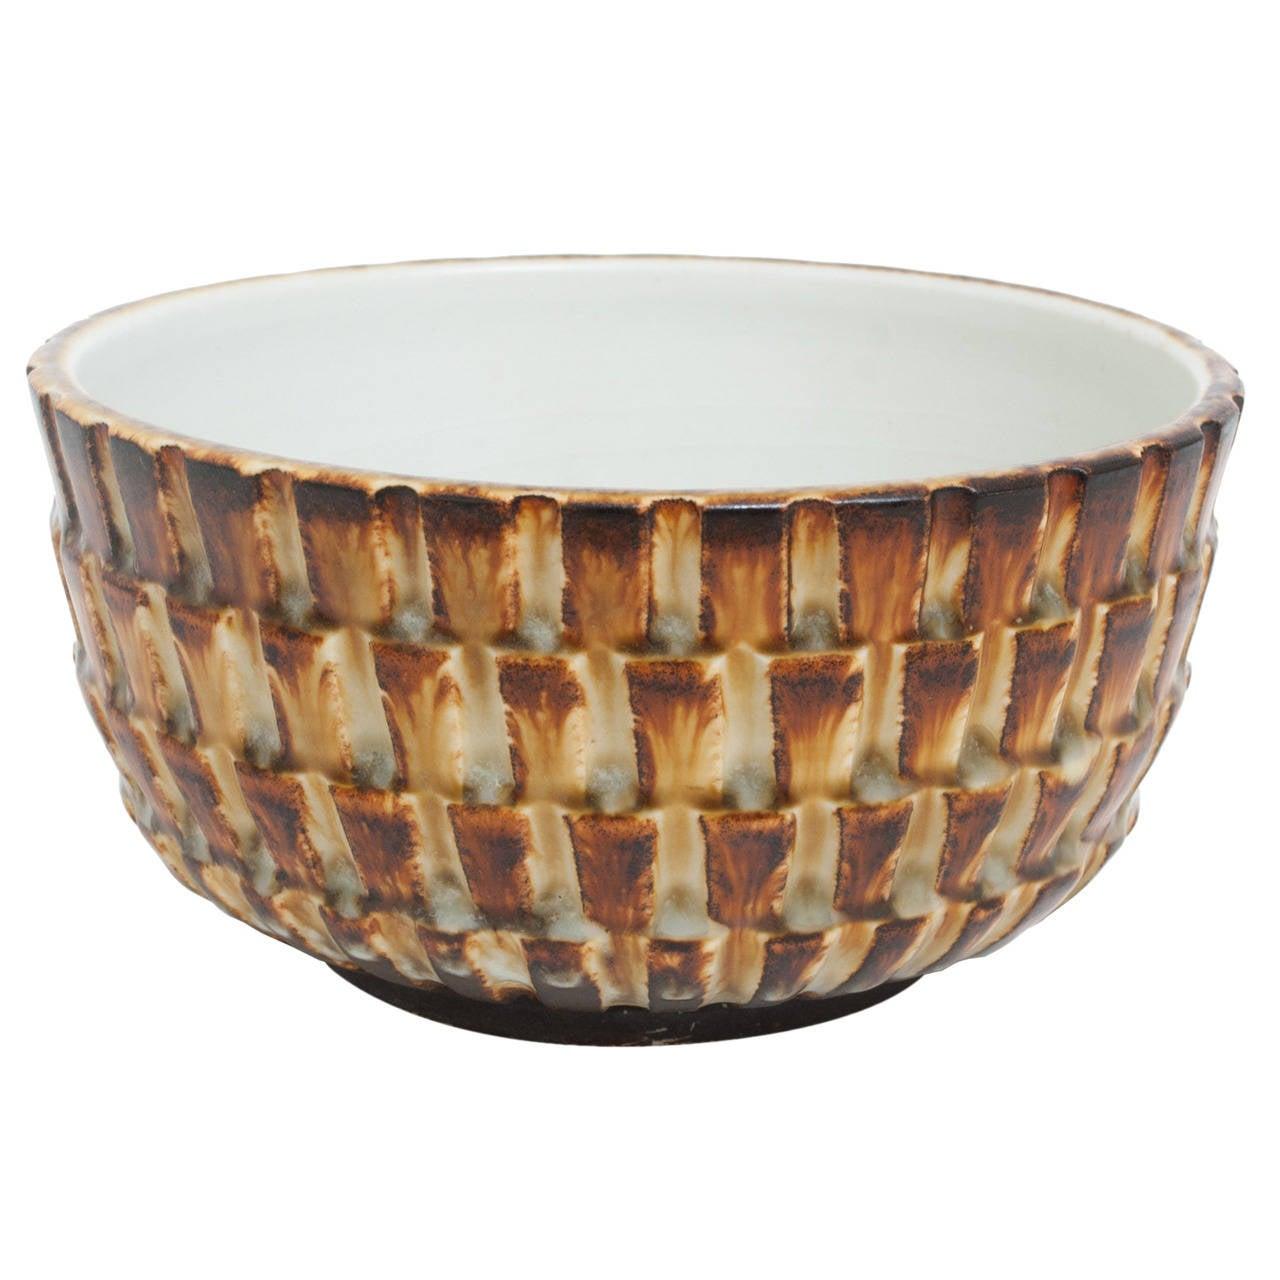 Scandinavian Modern textured ceramic bowl by Gertrud Lonegren, Rorstrand